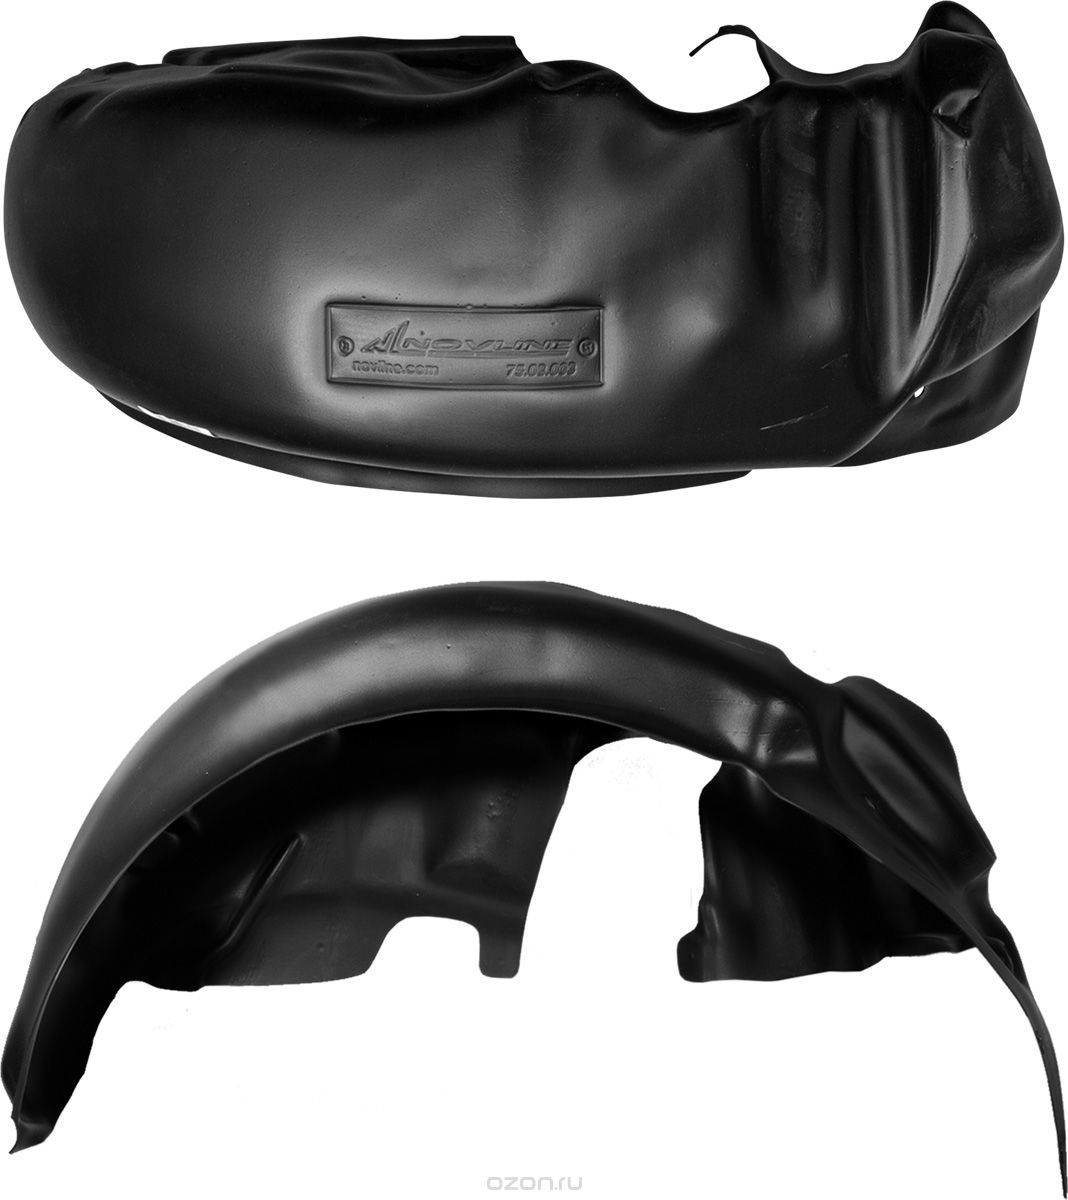 Подкрылок Novline-Autofamily, для Chevrolet Lacetti, 2004-2013, хэтчбек, седан, задний левый подкрылок novline autofamily chevrolet cobalt 2013 седан